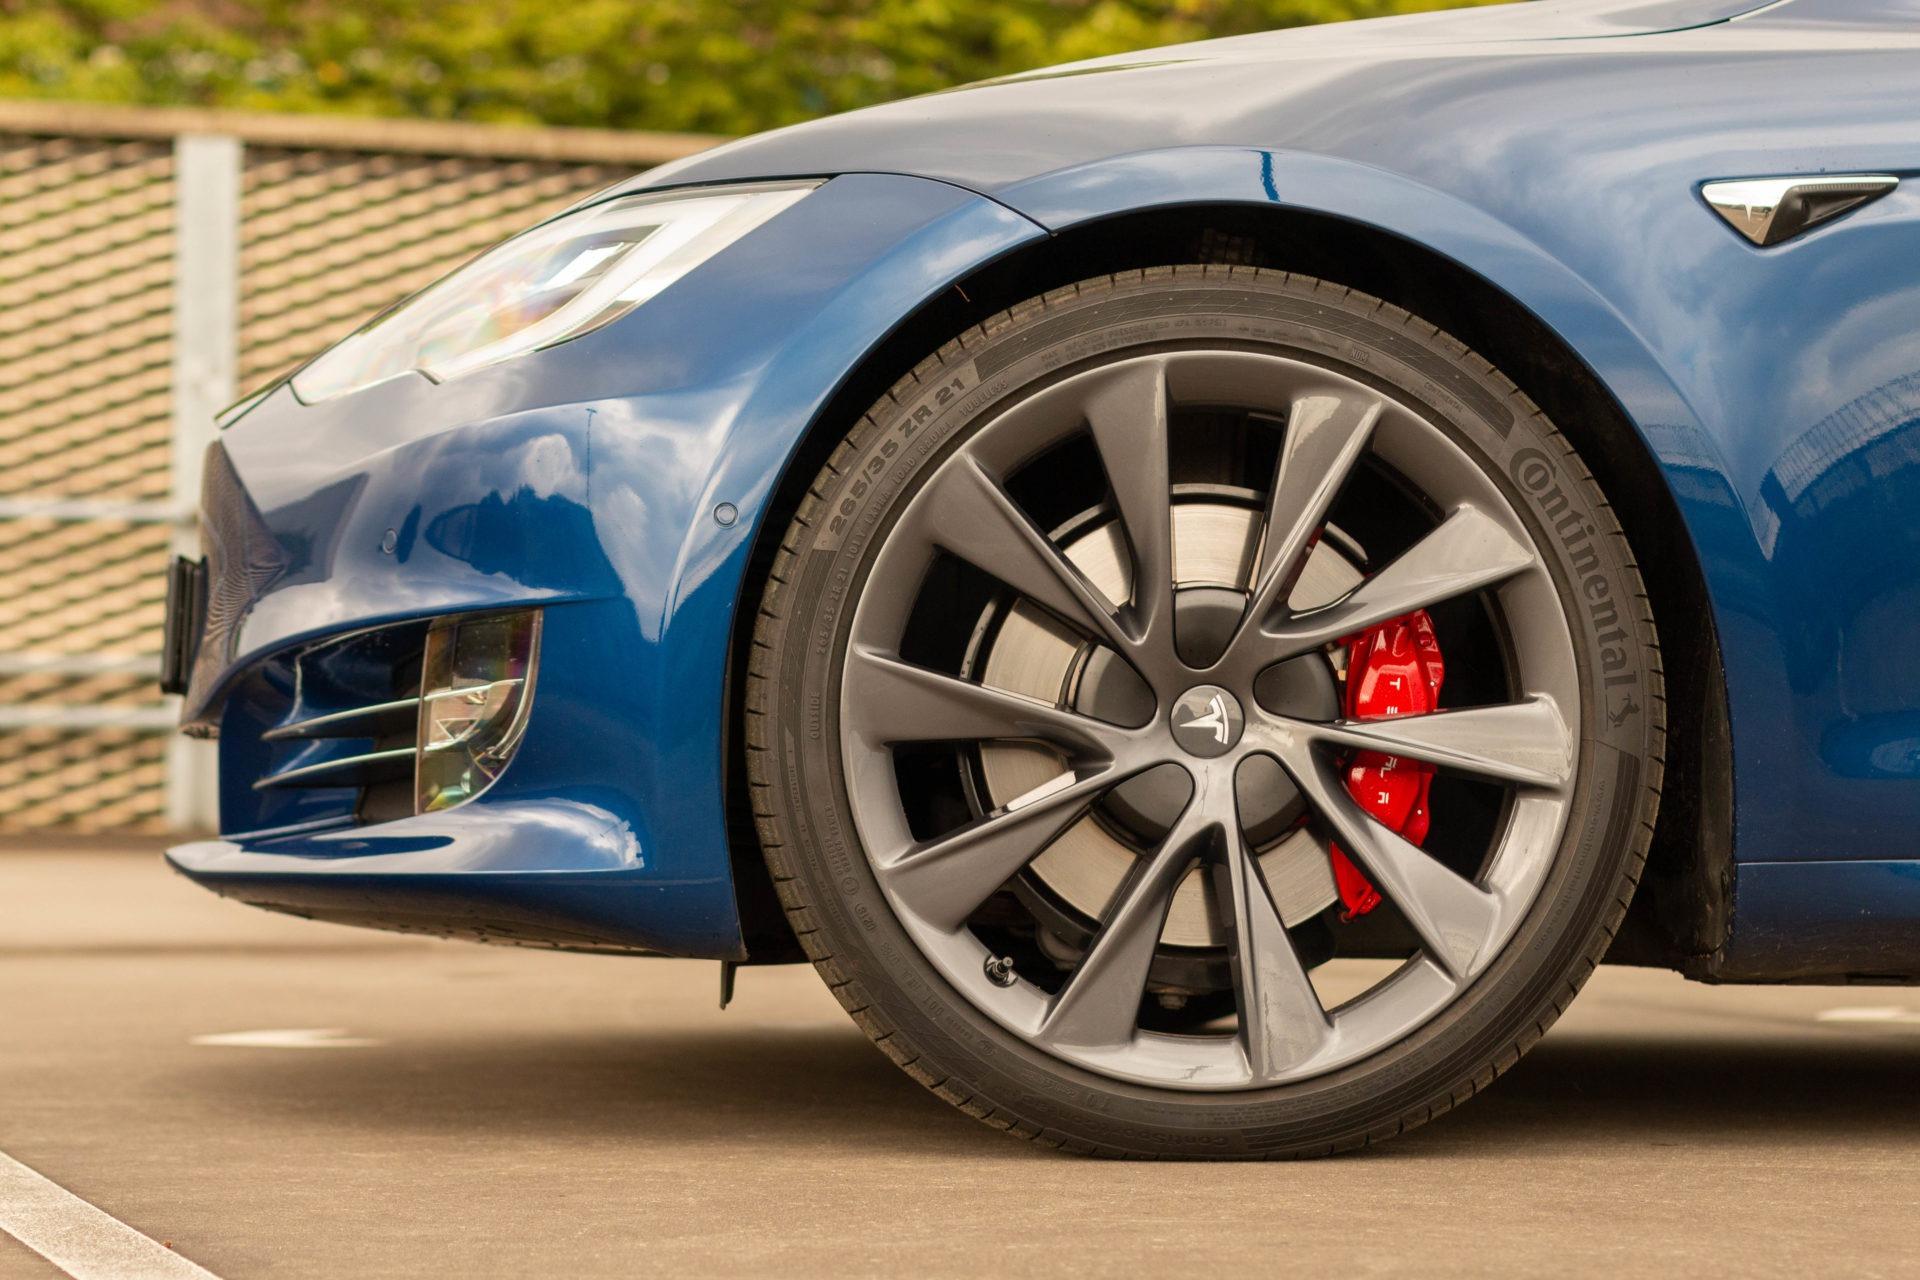 "Tesla Model S Performance ""Raven"" Blau 21 Zoll Felgen Garantie Autopilot 3 Karbon U-HiFi Premium Adaptive Luftfederung Premium-Innenraum"